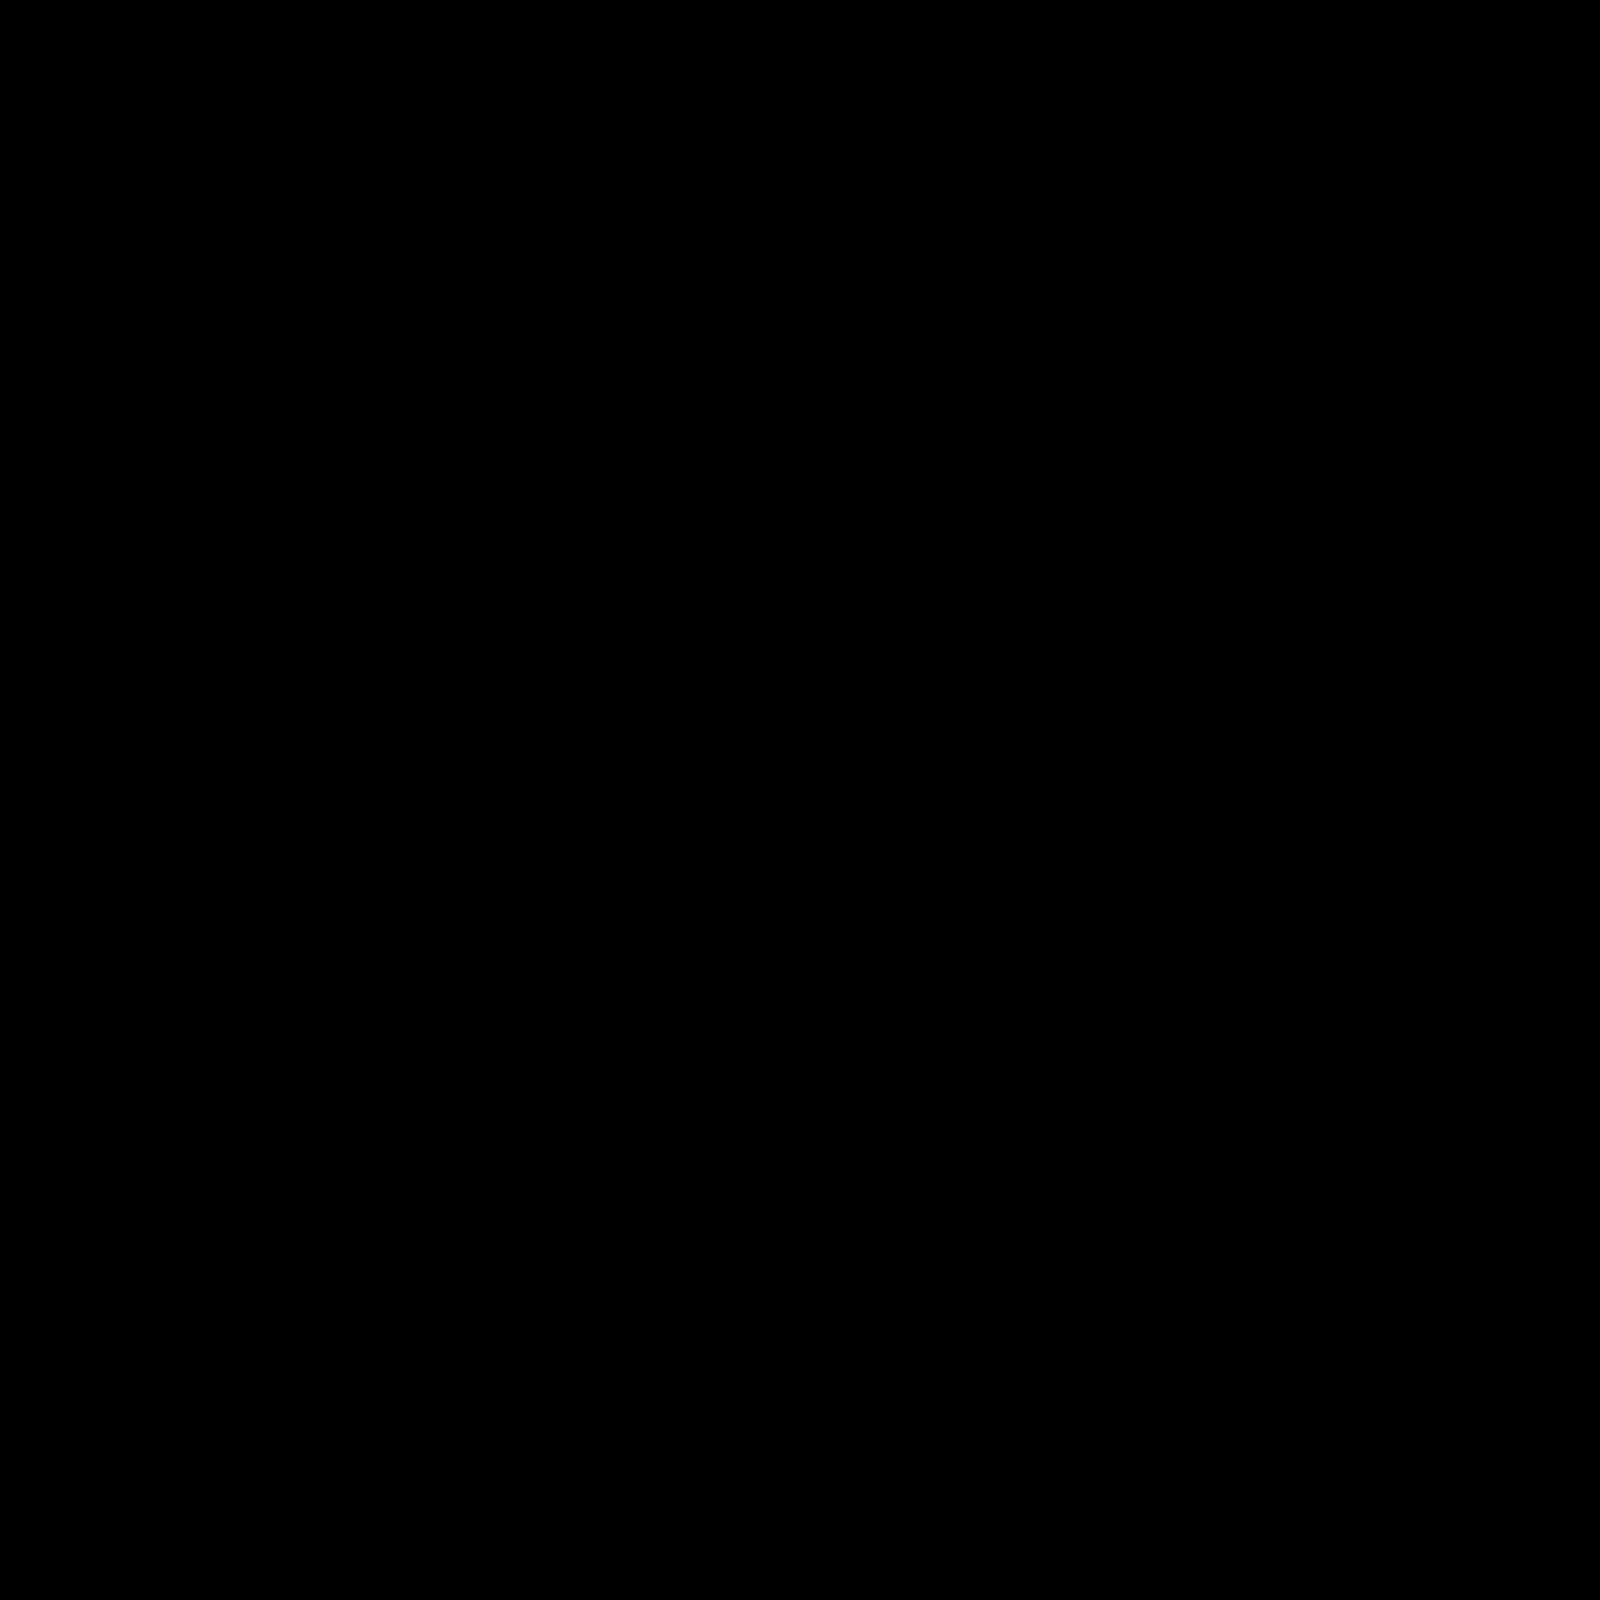 Миномет PNG